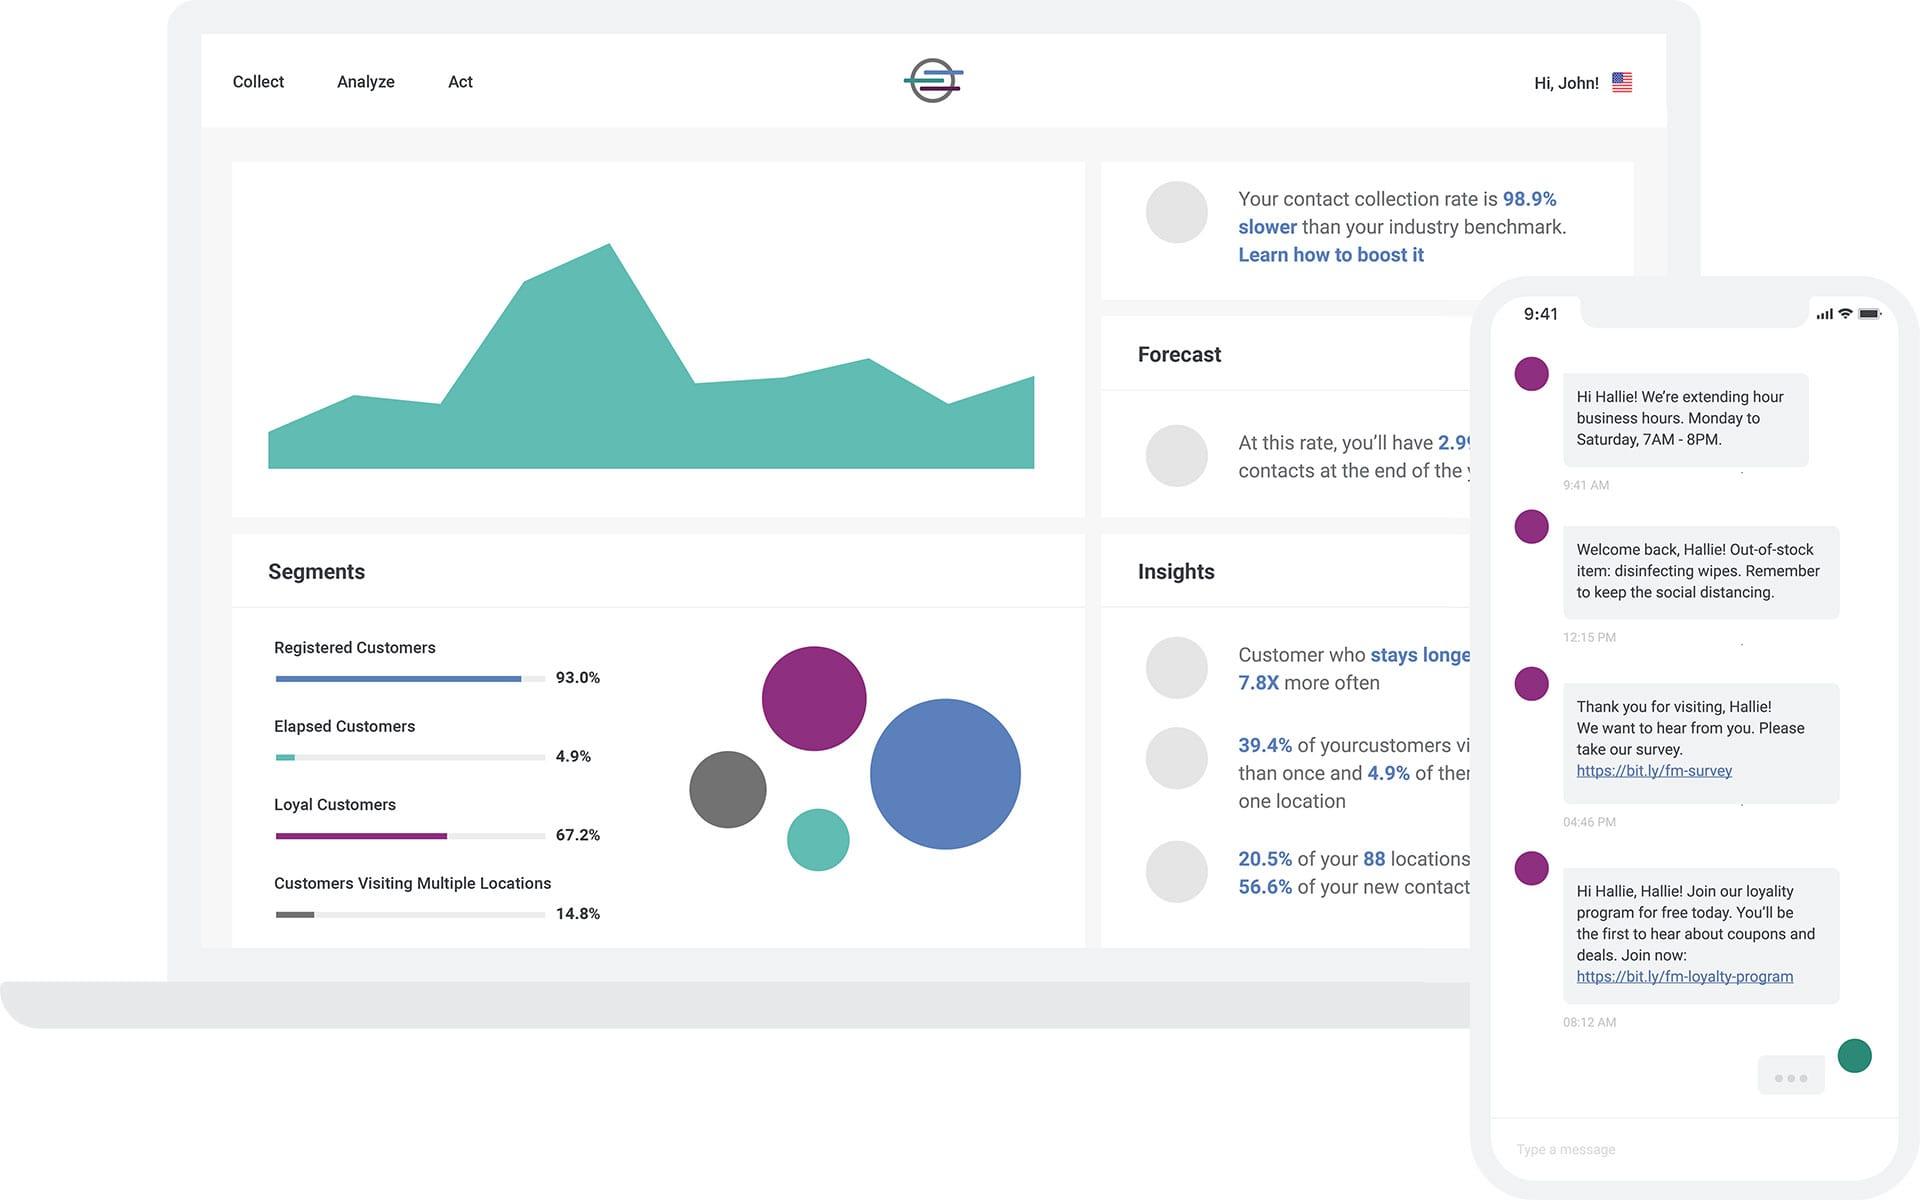 location-based customer insights